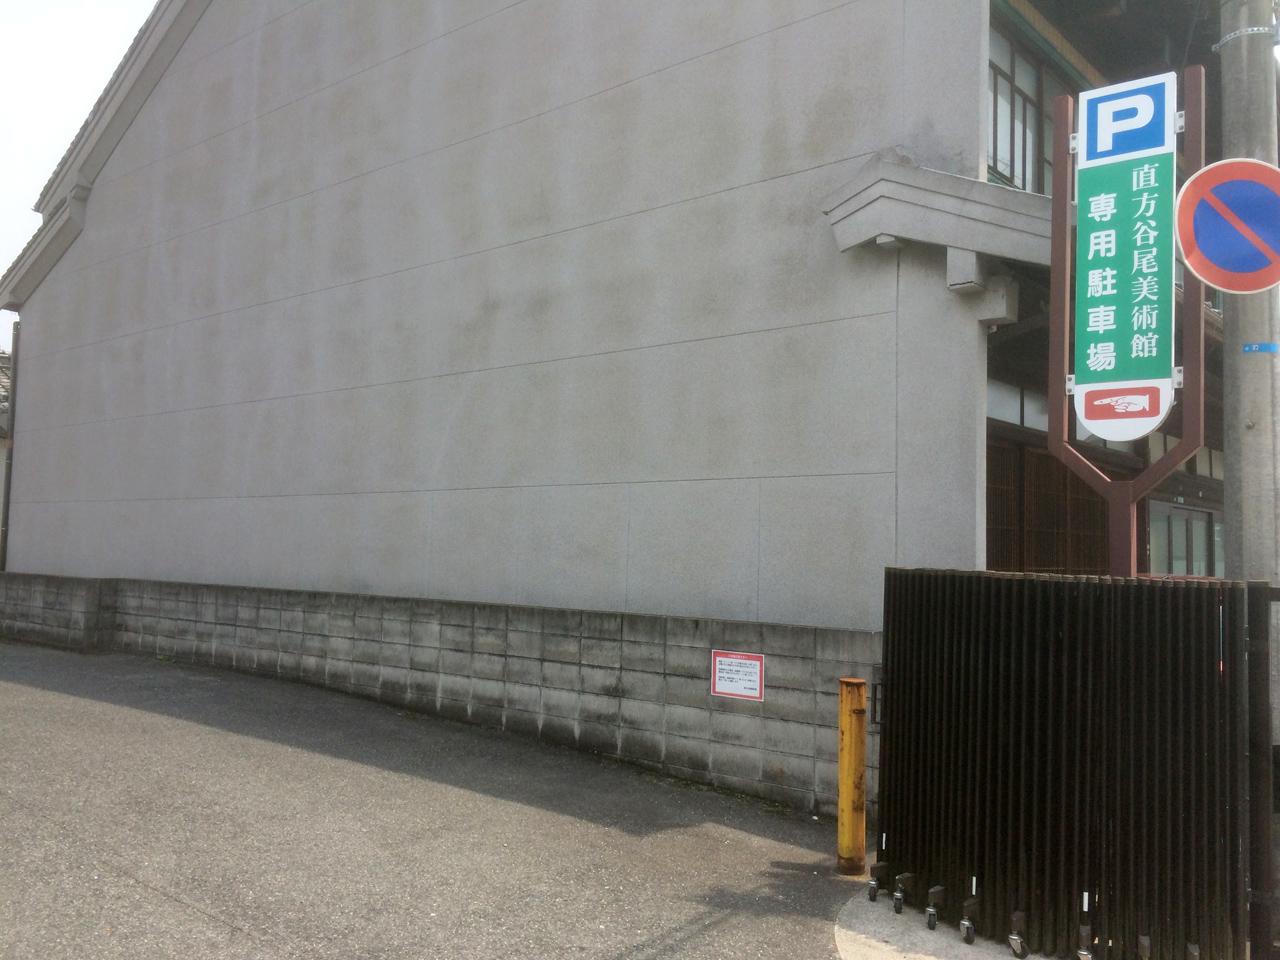 直方谷尾美術館の駐車場